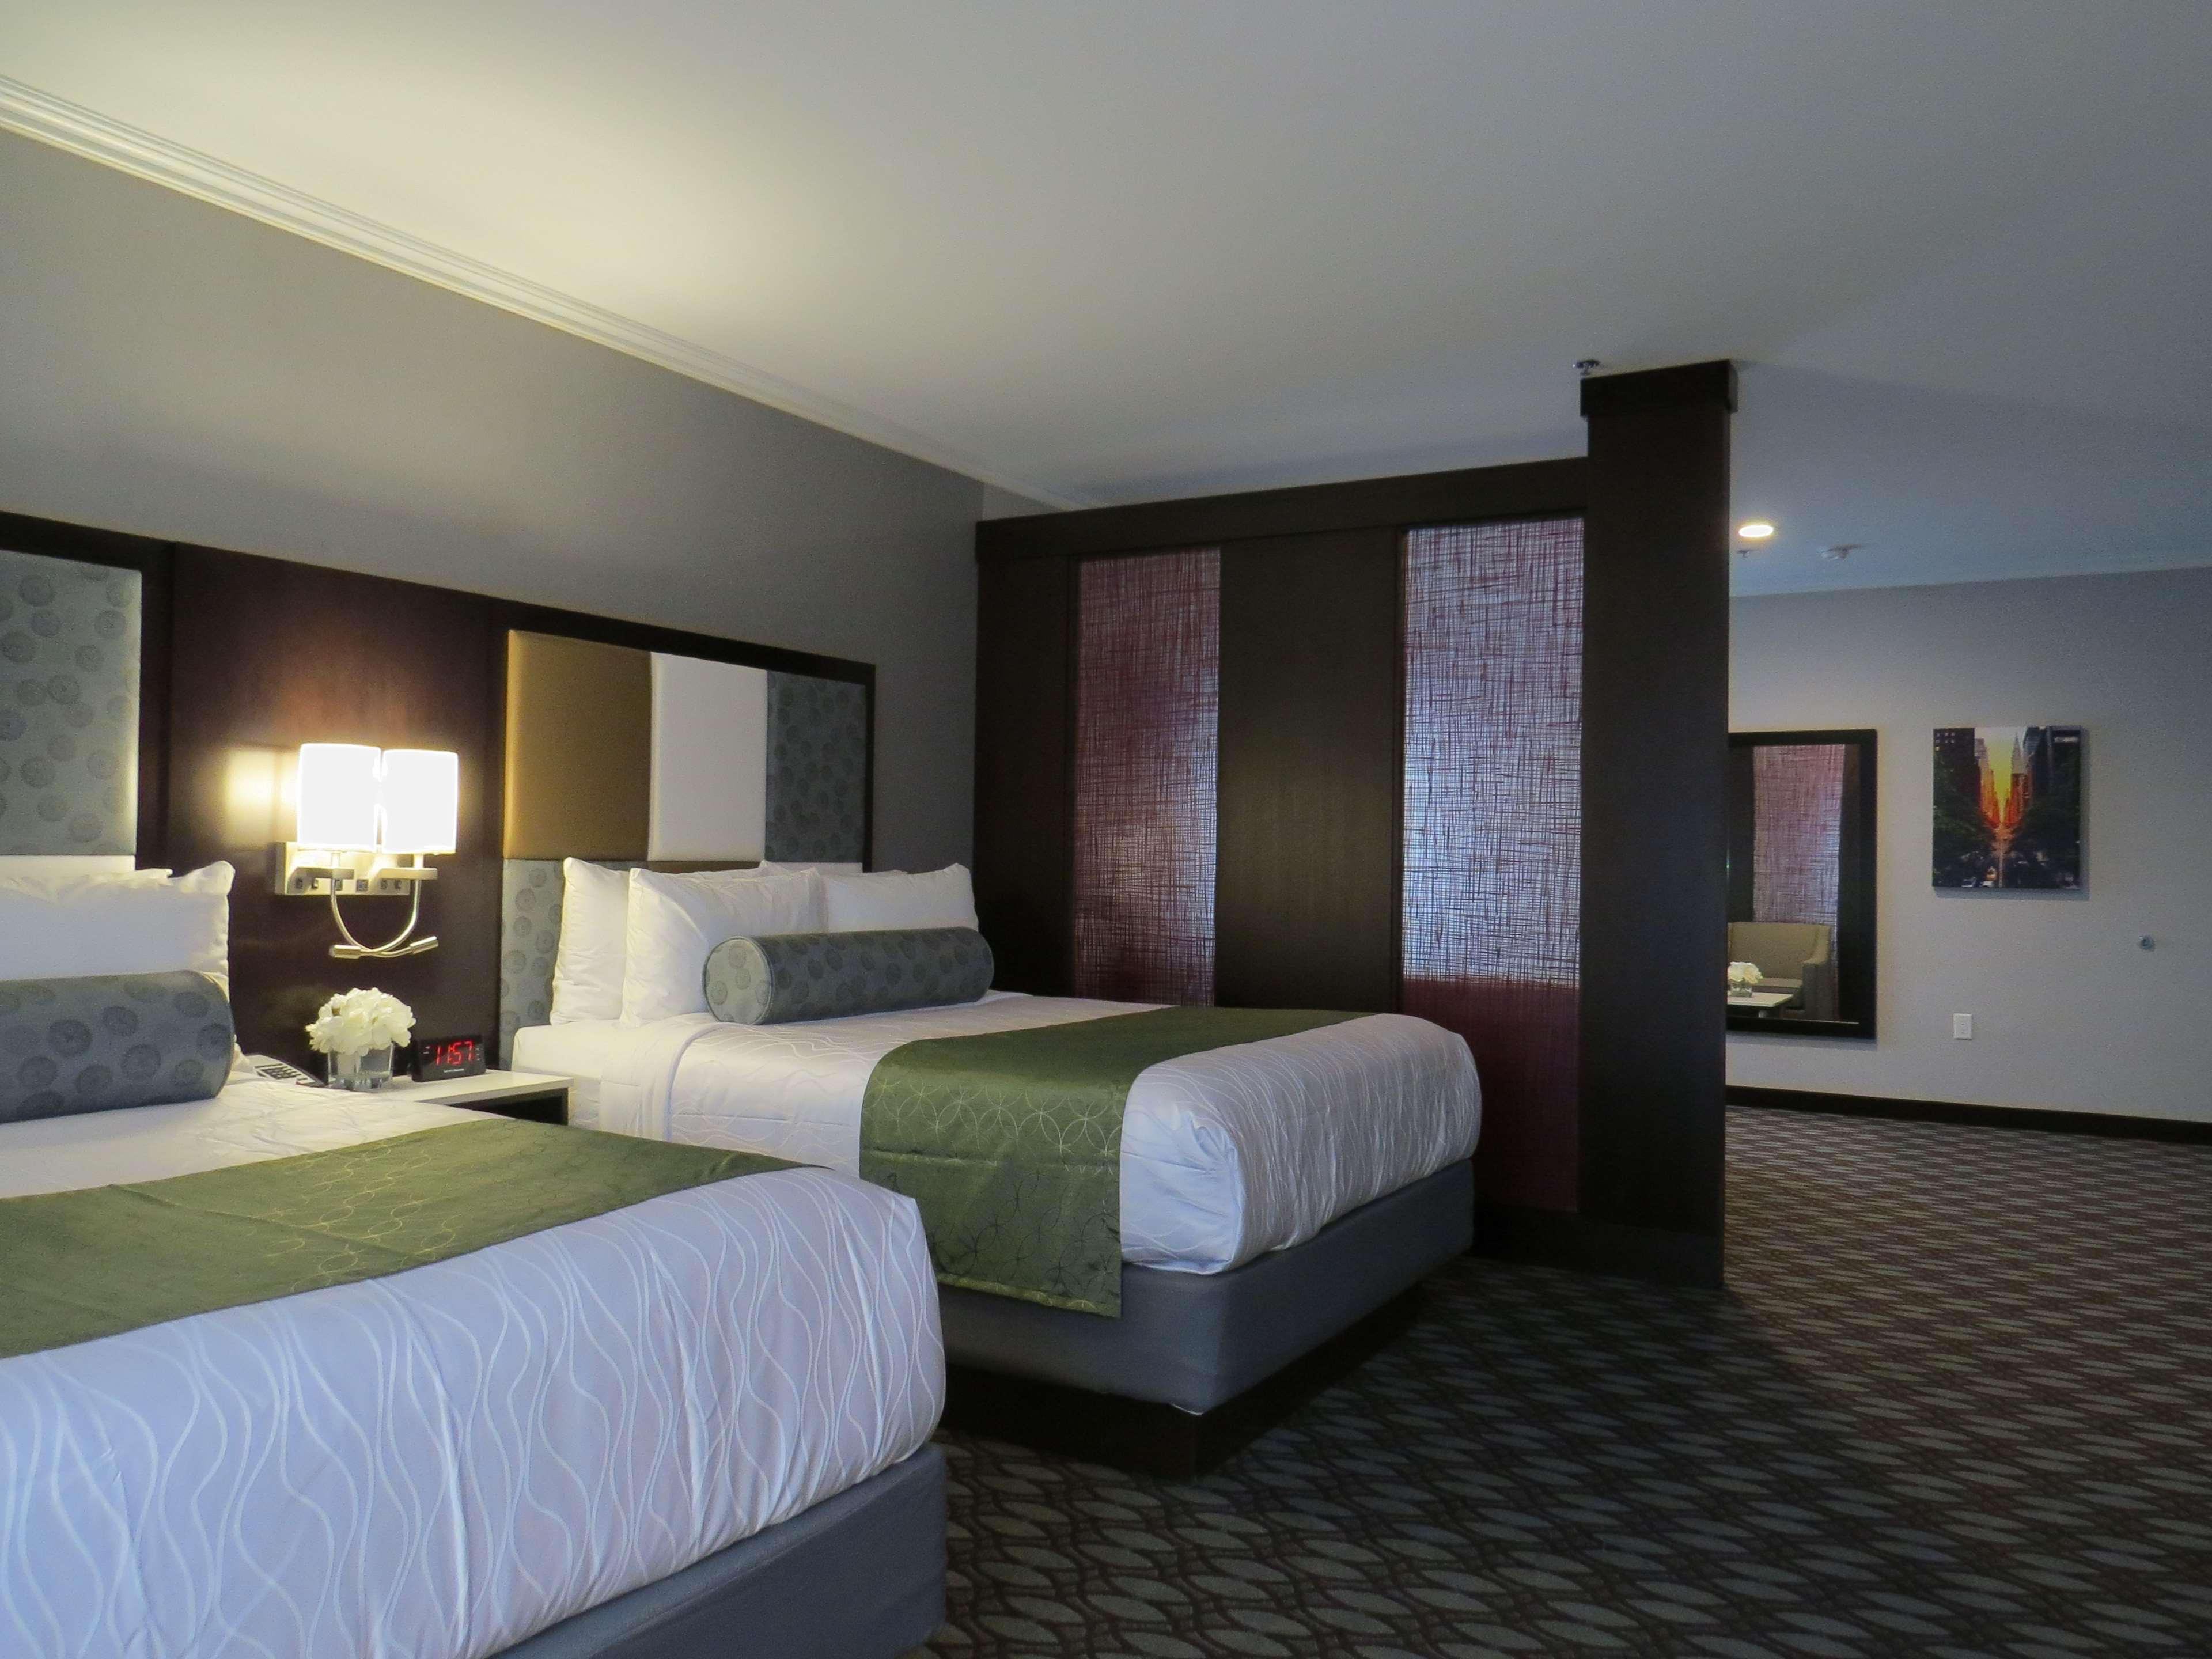 Best Western Premier NYC Gateway Hotel image 17